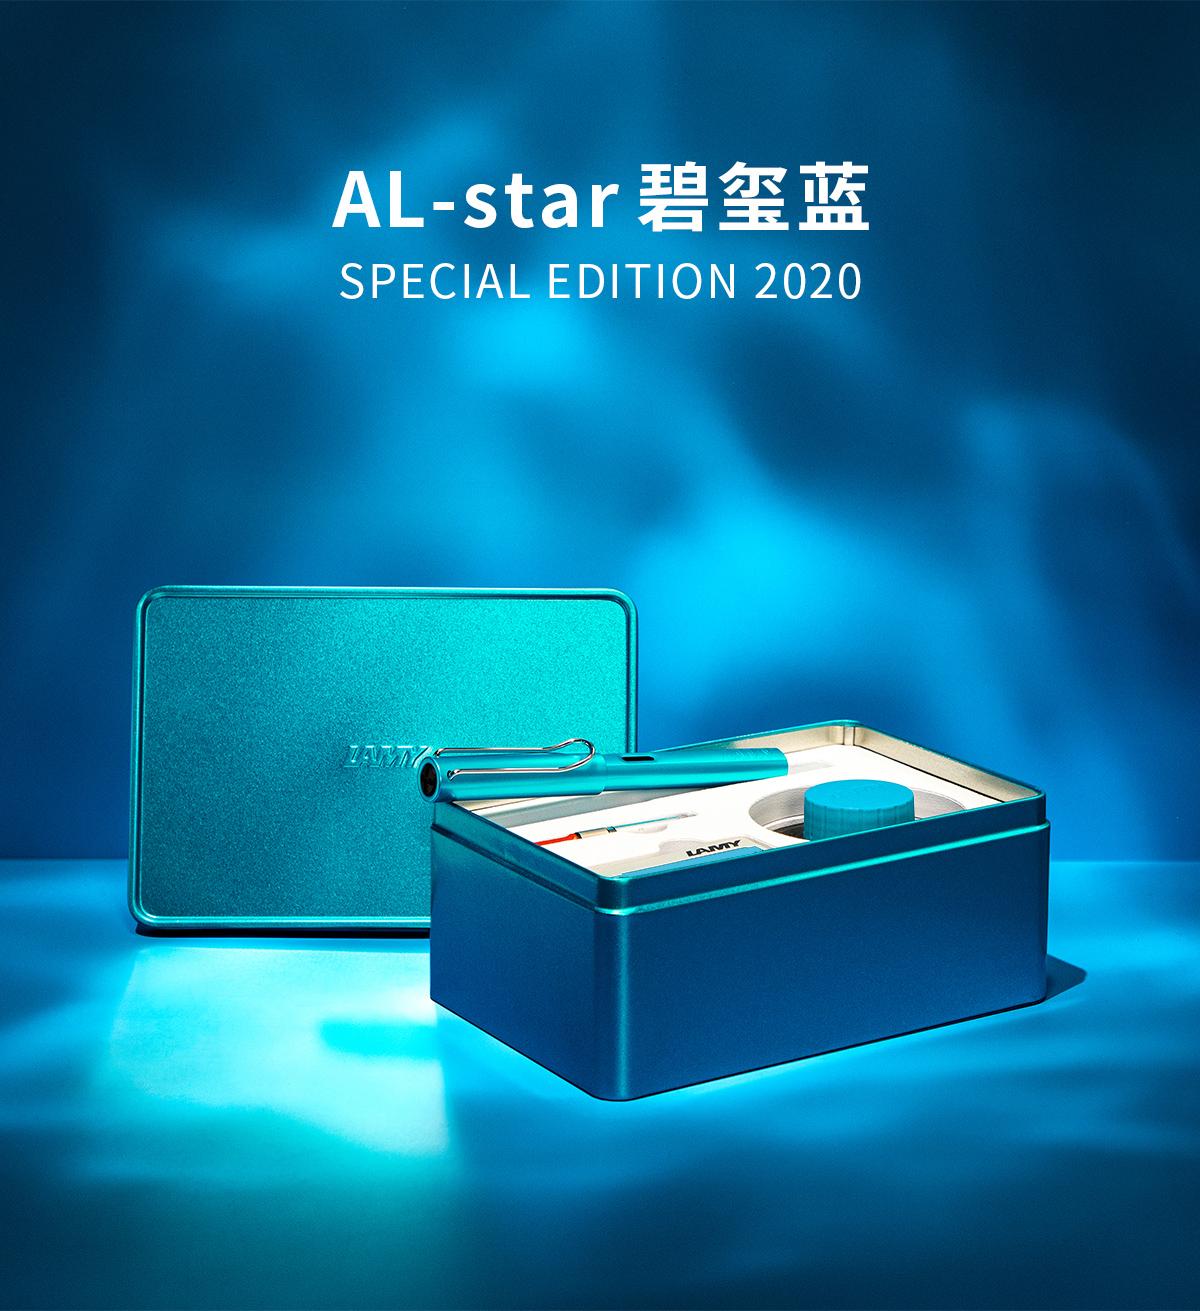 LAMY/凌美Al-star恒星新品碧玺蓝墨水钢笔礼盒